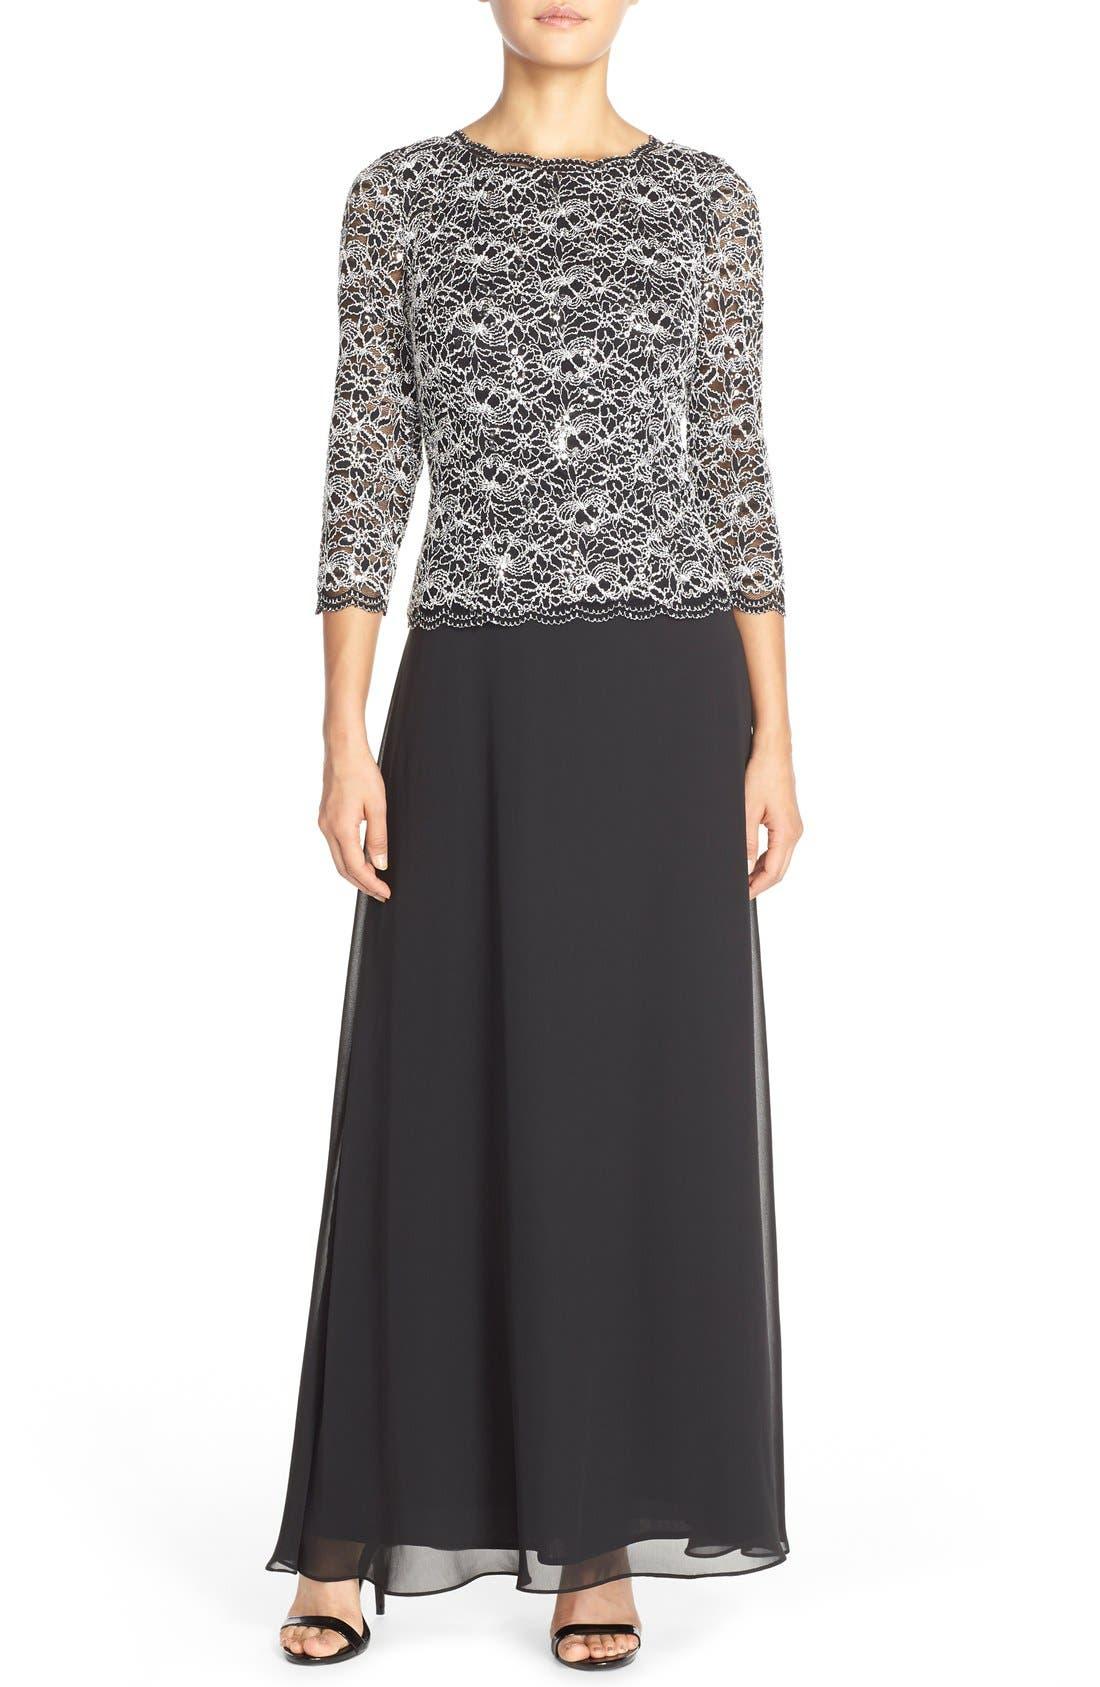 Lace & Chiffon Mock Two-Piece Gown,                             Main thumbnail 1, color,                             Black/ White